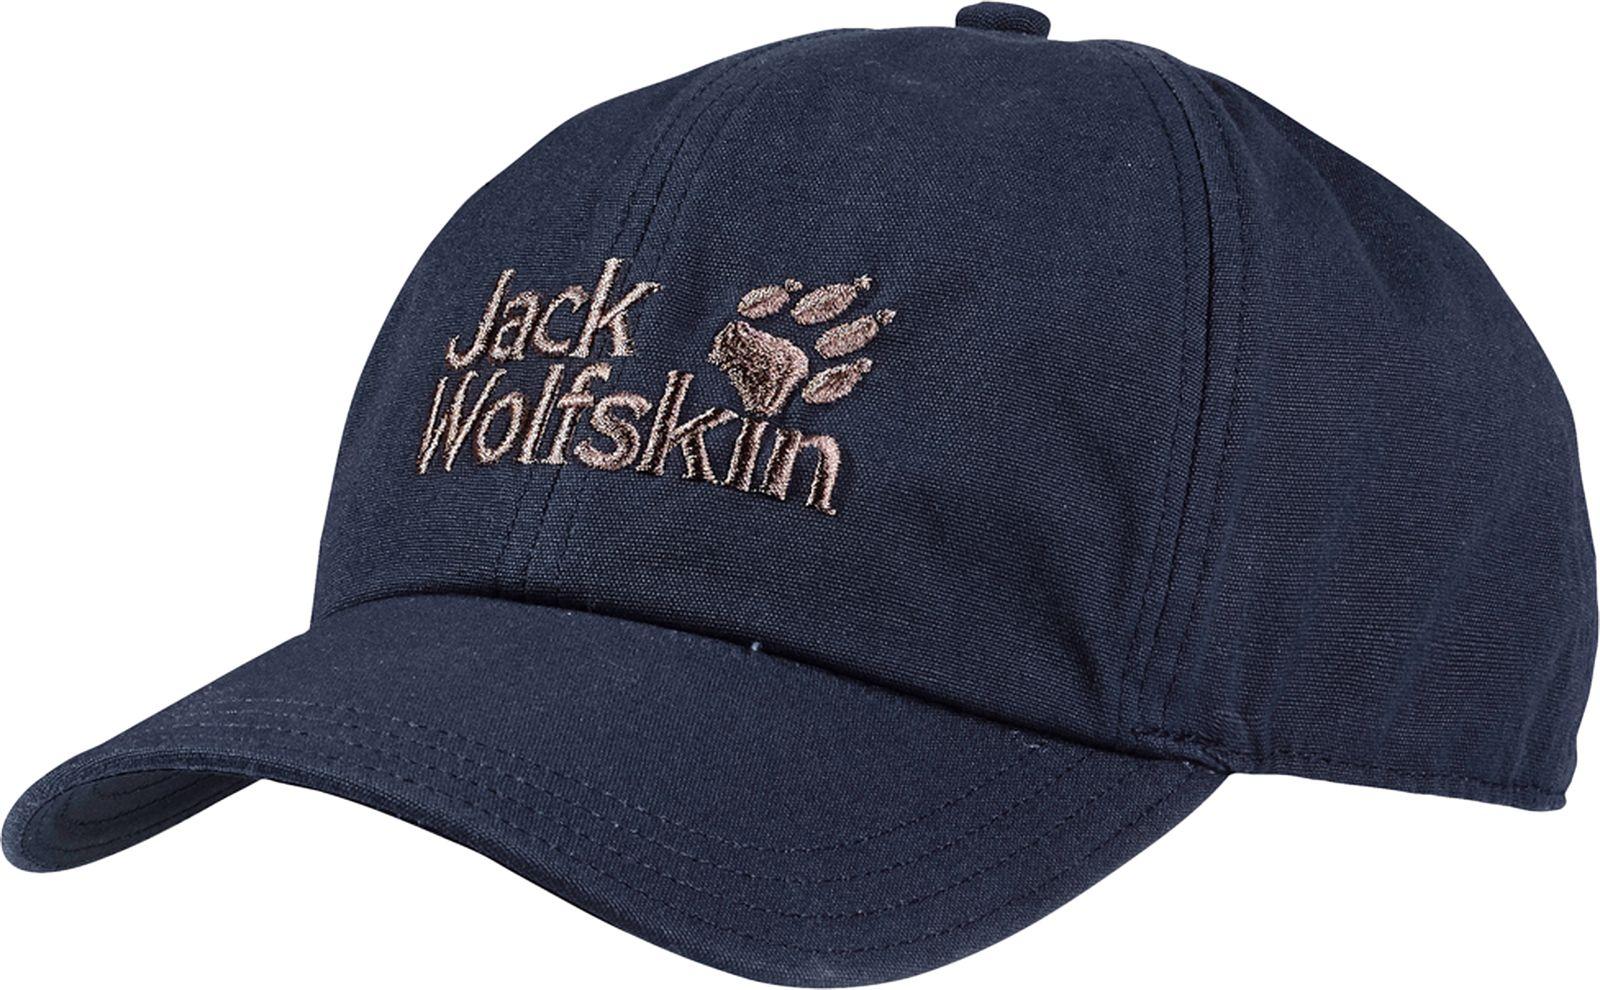 Бейсболка Jack Wolfskin Baseball Cap, цвет: темно-синий. 1900671_1010. Размер универсальный снуд jack wolfskin jack wolfskin ja021guwha98